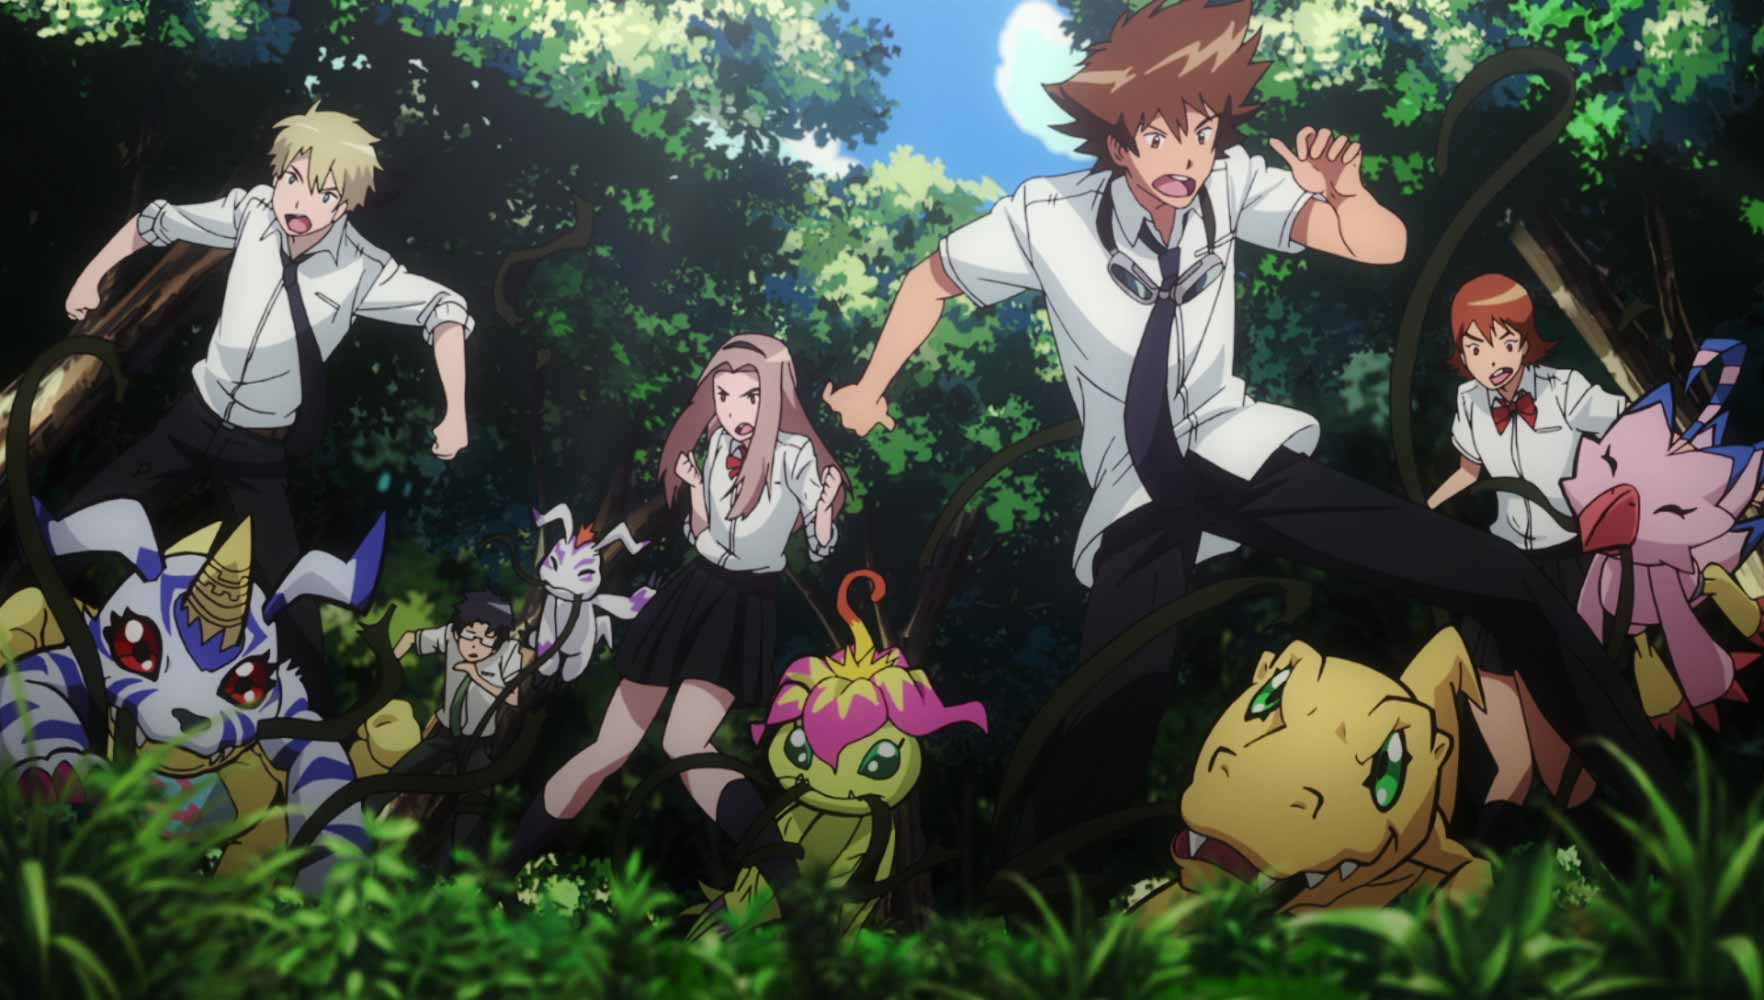 'Digimon Adventure tri.: Coexistence' English Dub Gets One-Night Theatrical Premiere